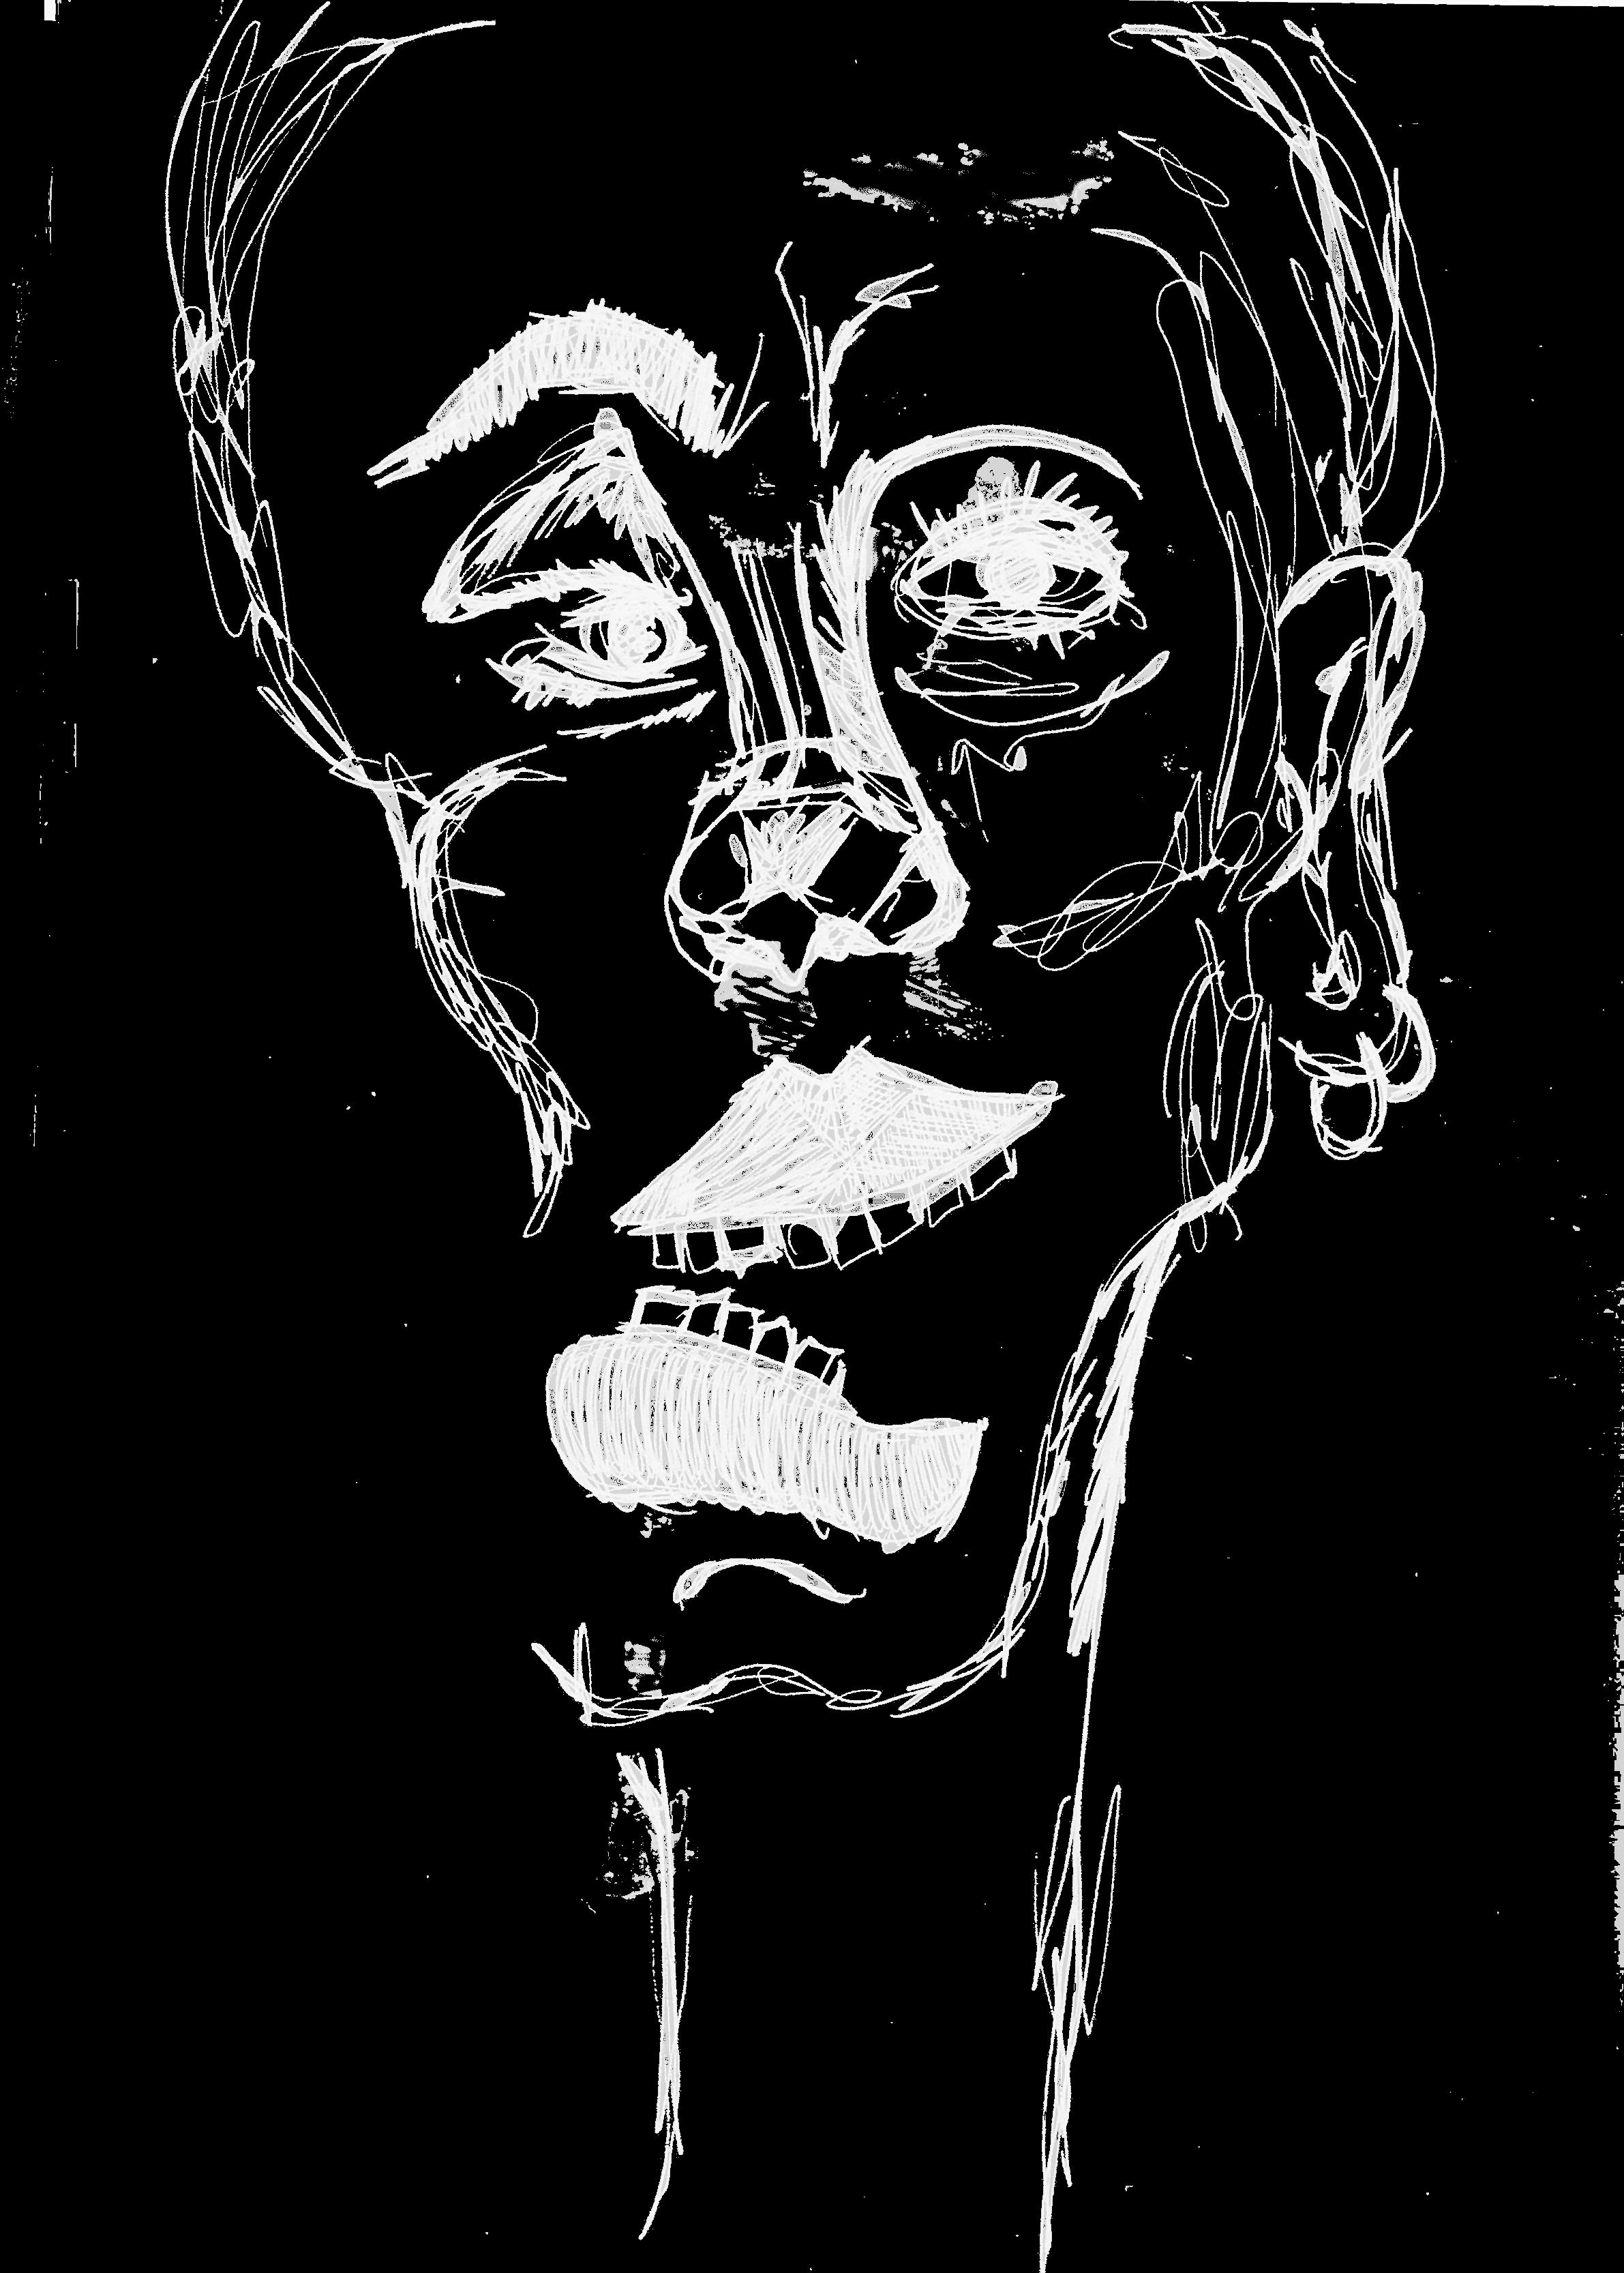 helatomic-artwork-ullustration